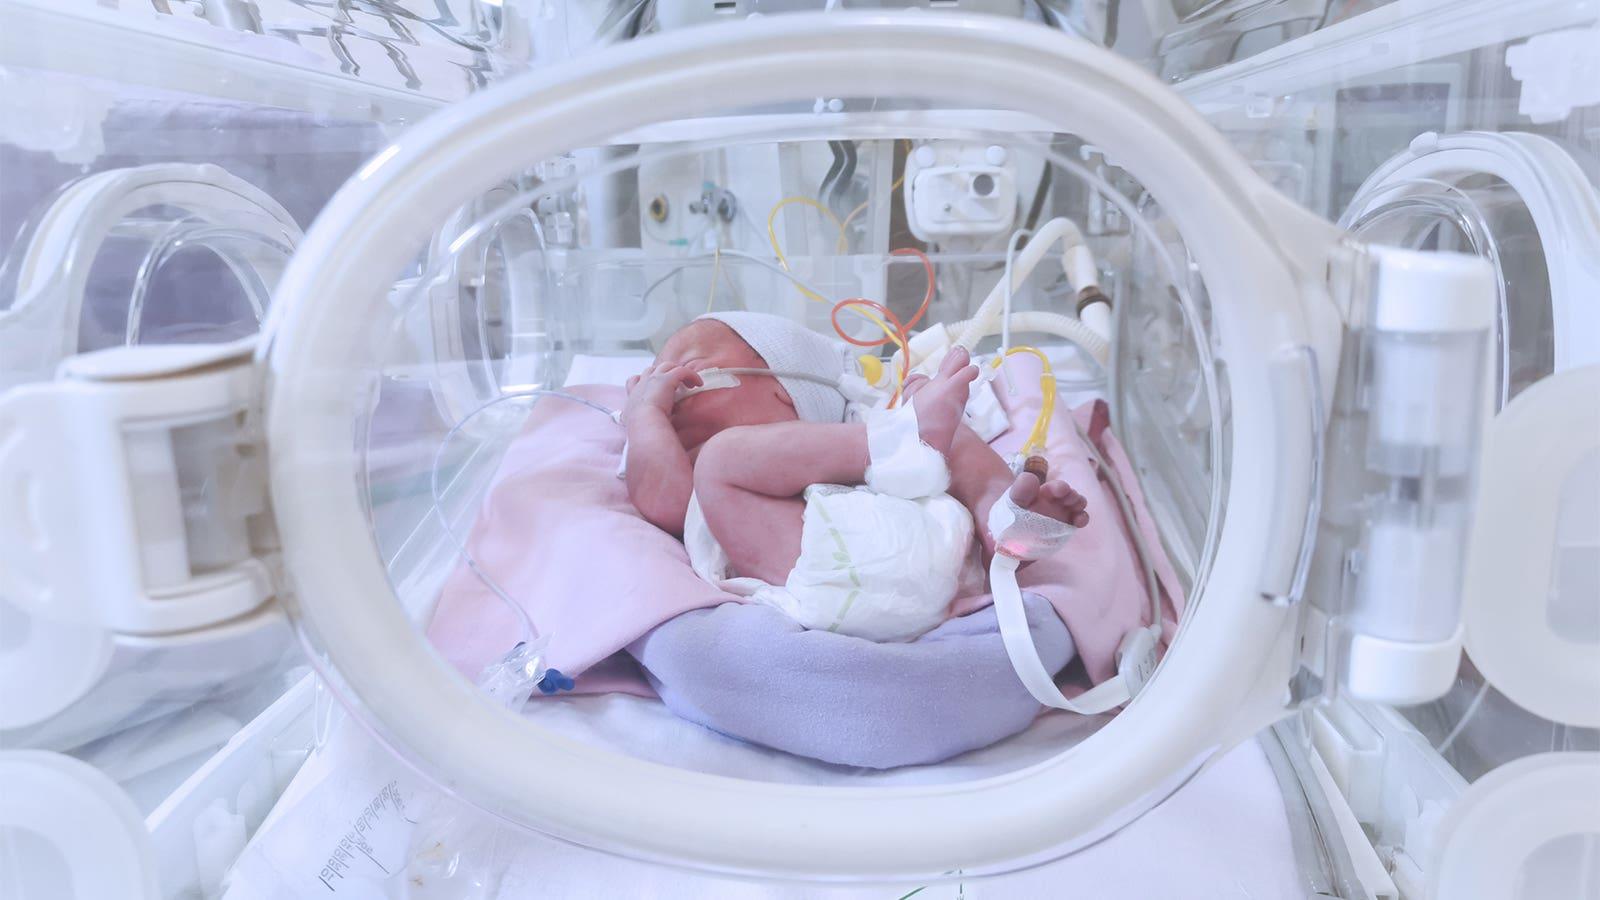 A preterm infant in an incubator in the neonatal ICU.